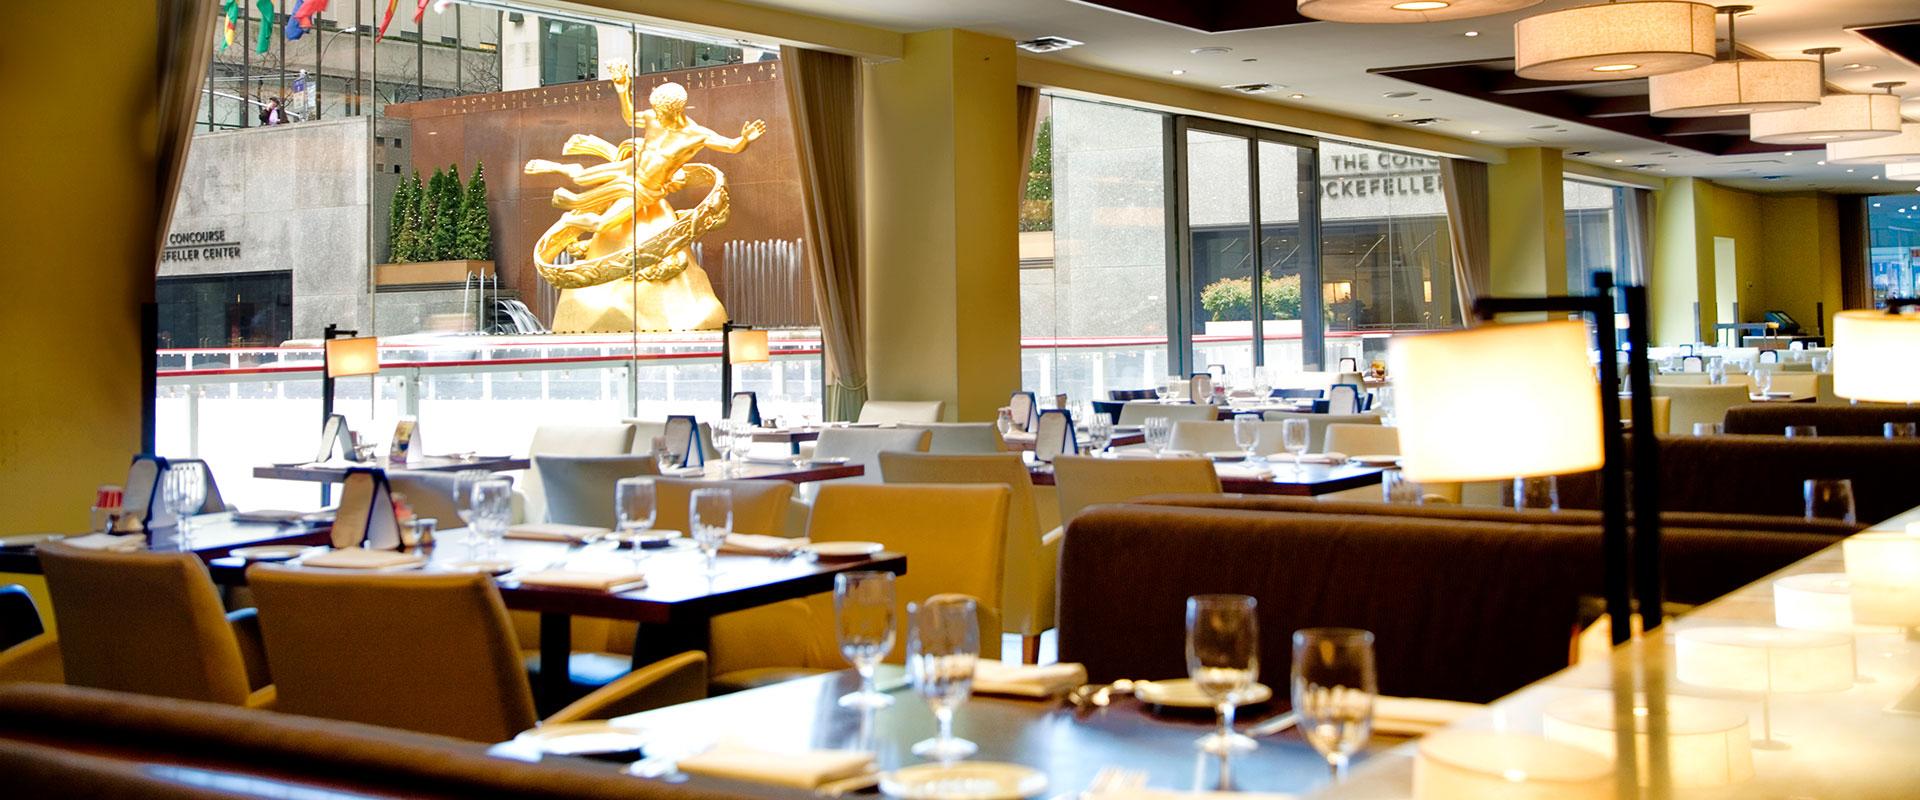 Stella 34 Trattoria & Bar | Best Italian Restaurant NYC